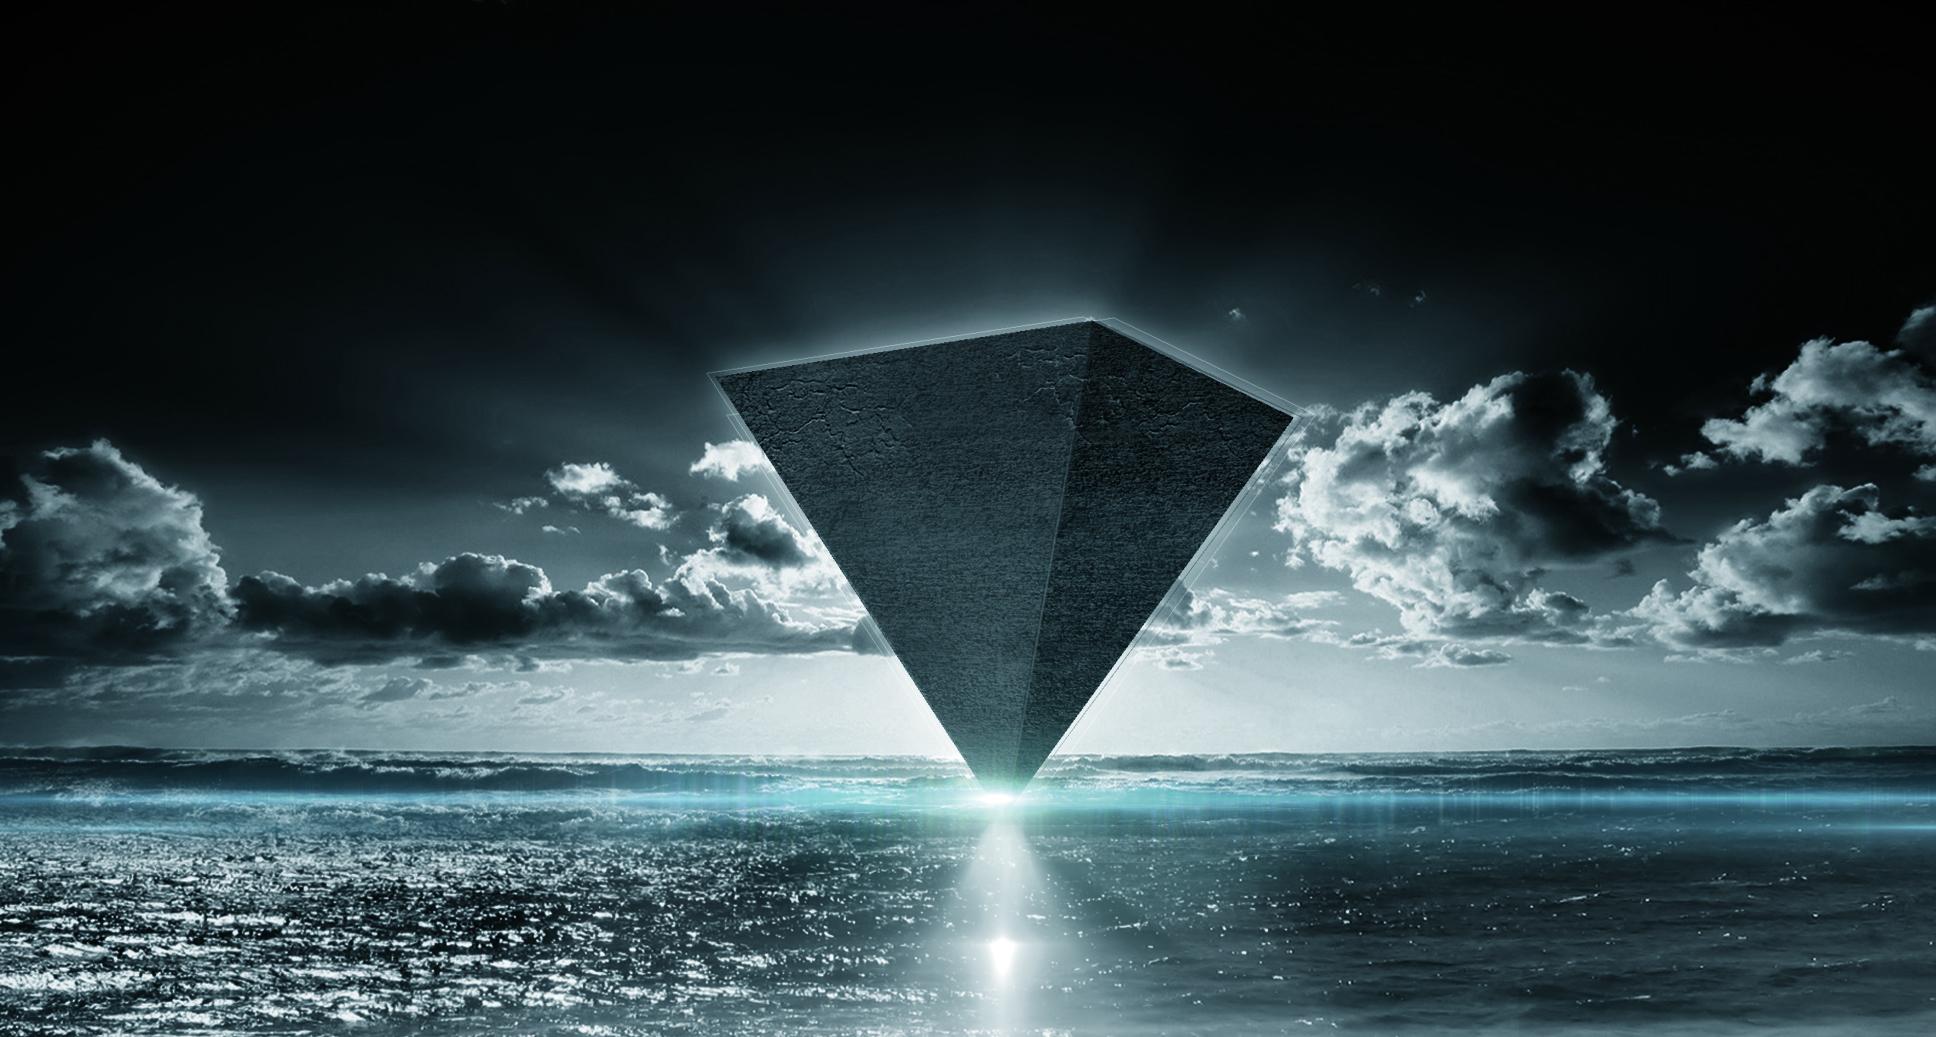 wallpaper high pyramide ep 2 by 0mega hd on deviantart